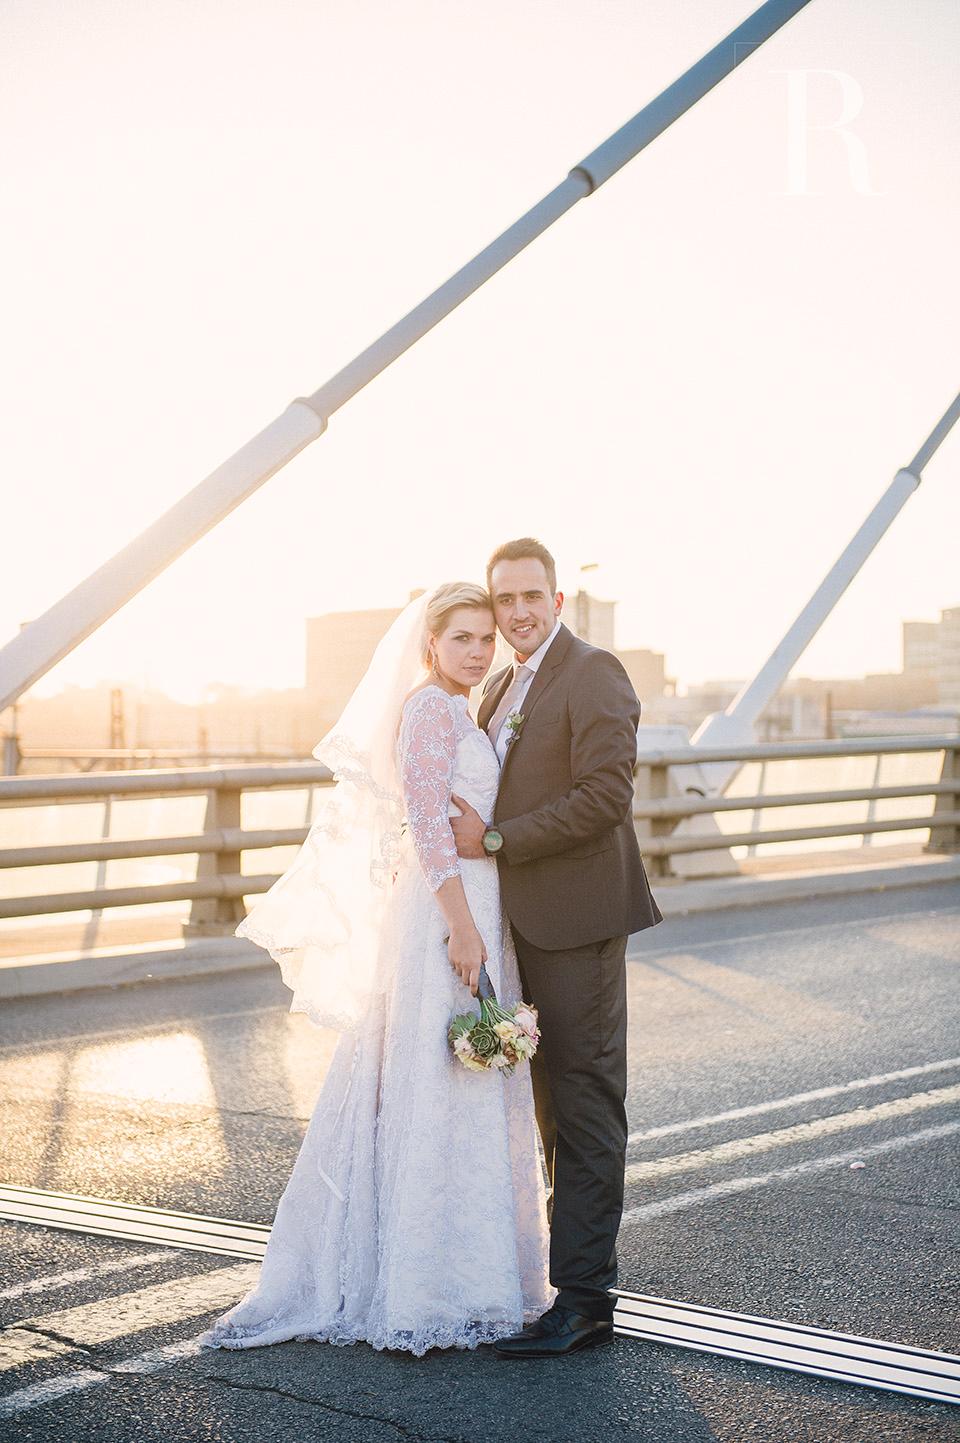 RYAN PARKER PHOTOGRAPHY_WEDDINGS_JOHANNESBURG_SHINE STUDIOS_R&M-0935.jpg